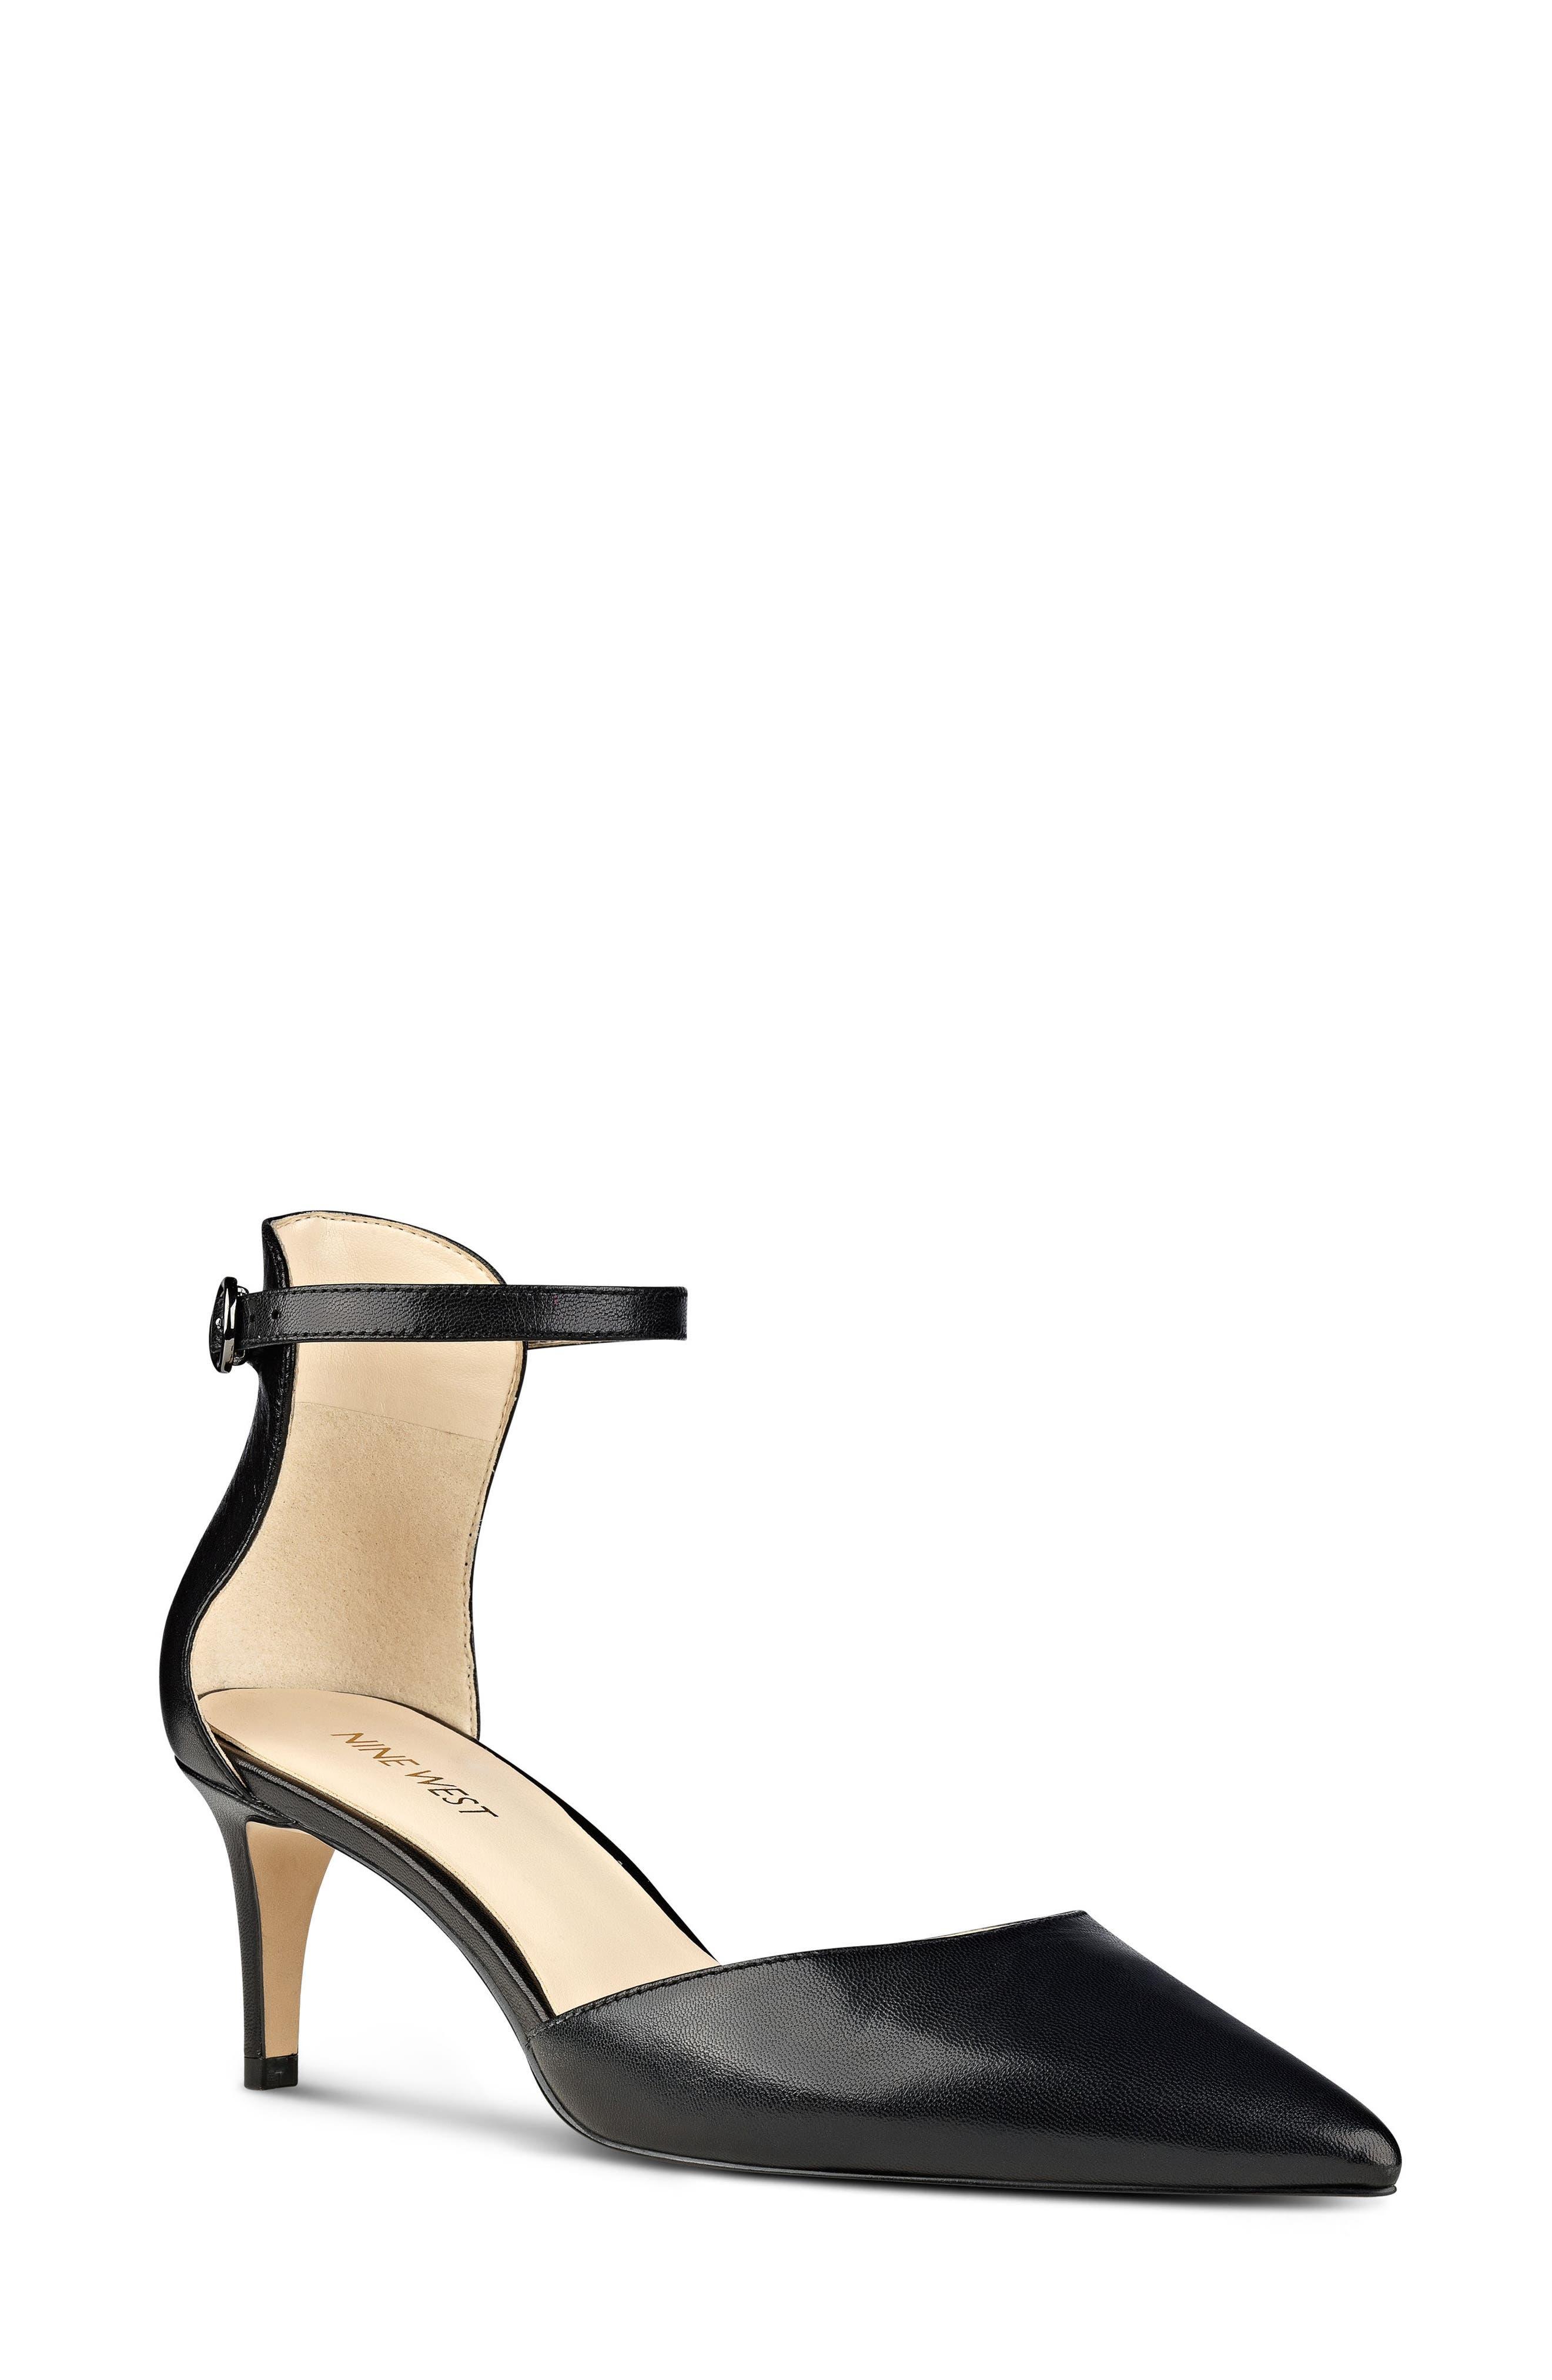 NINE WEST,                             Sharmila Ankle Strap d'Orsay Pump,                             Main thumbnail 1, color,                             001